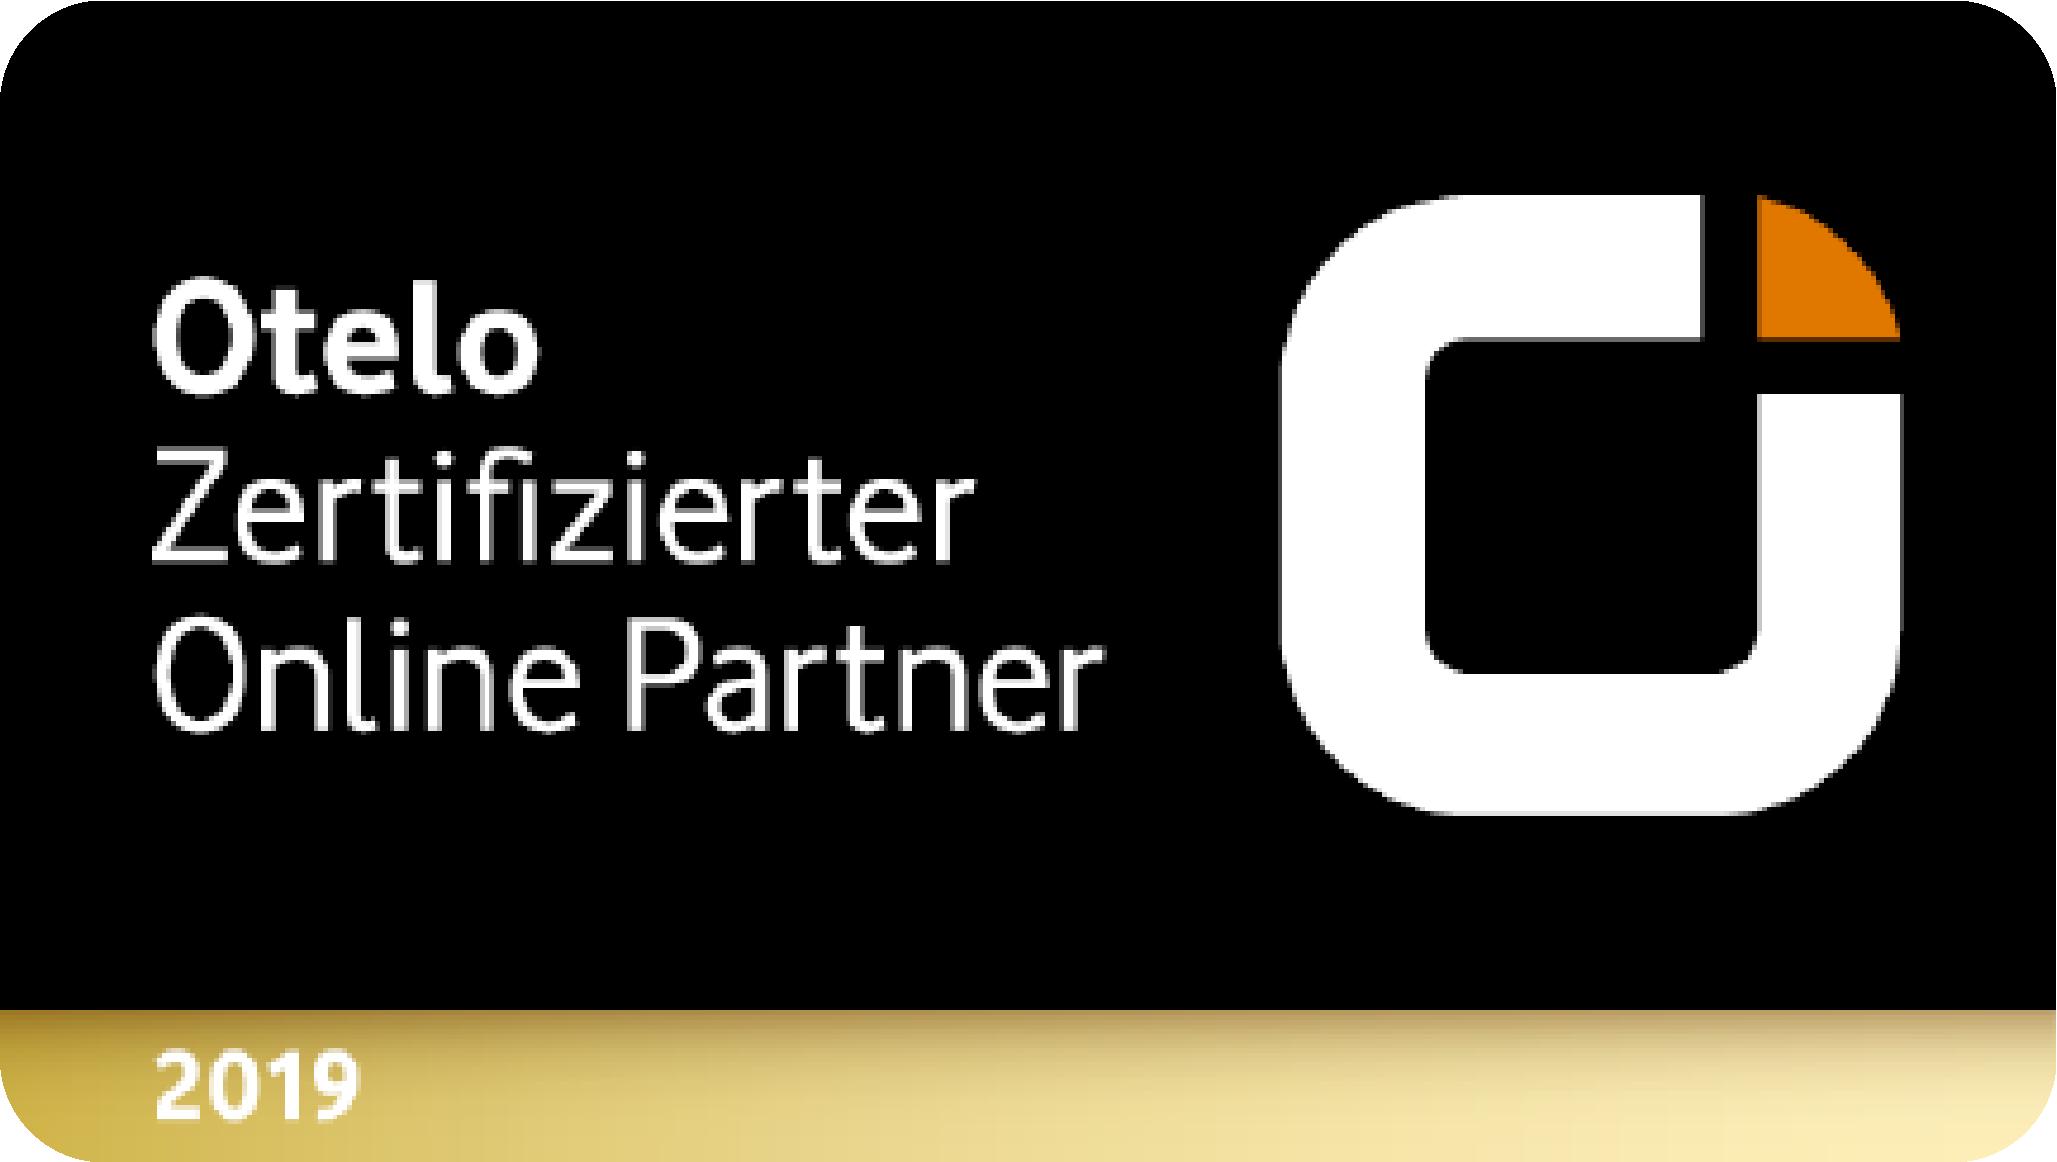 Otelo Internet Vertriebspartner